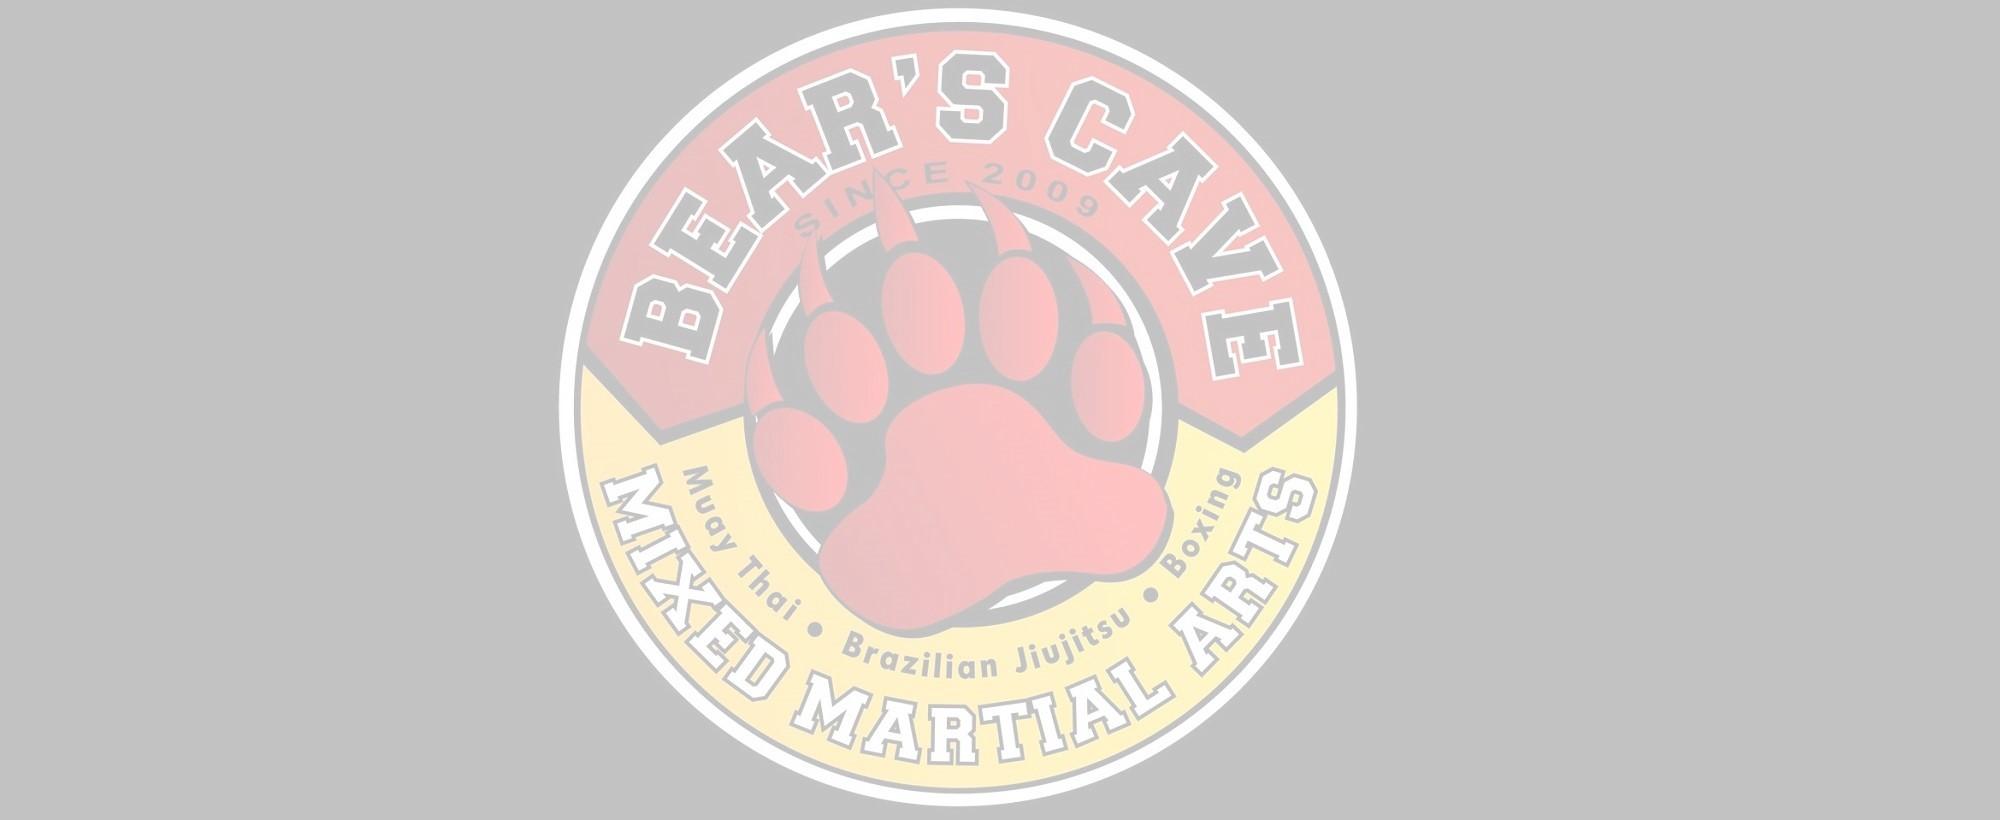 Bear's Cave; Success Stories